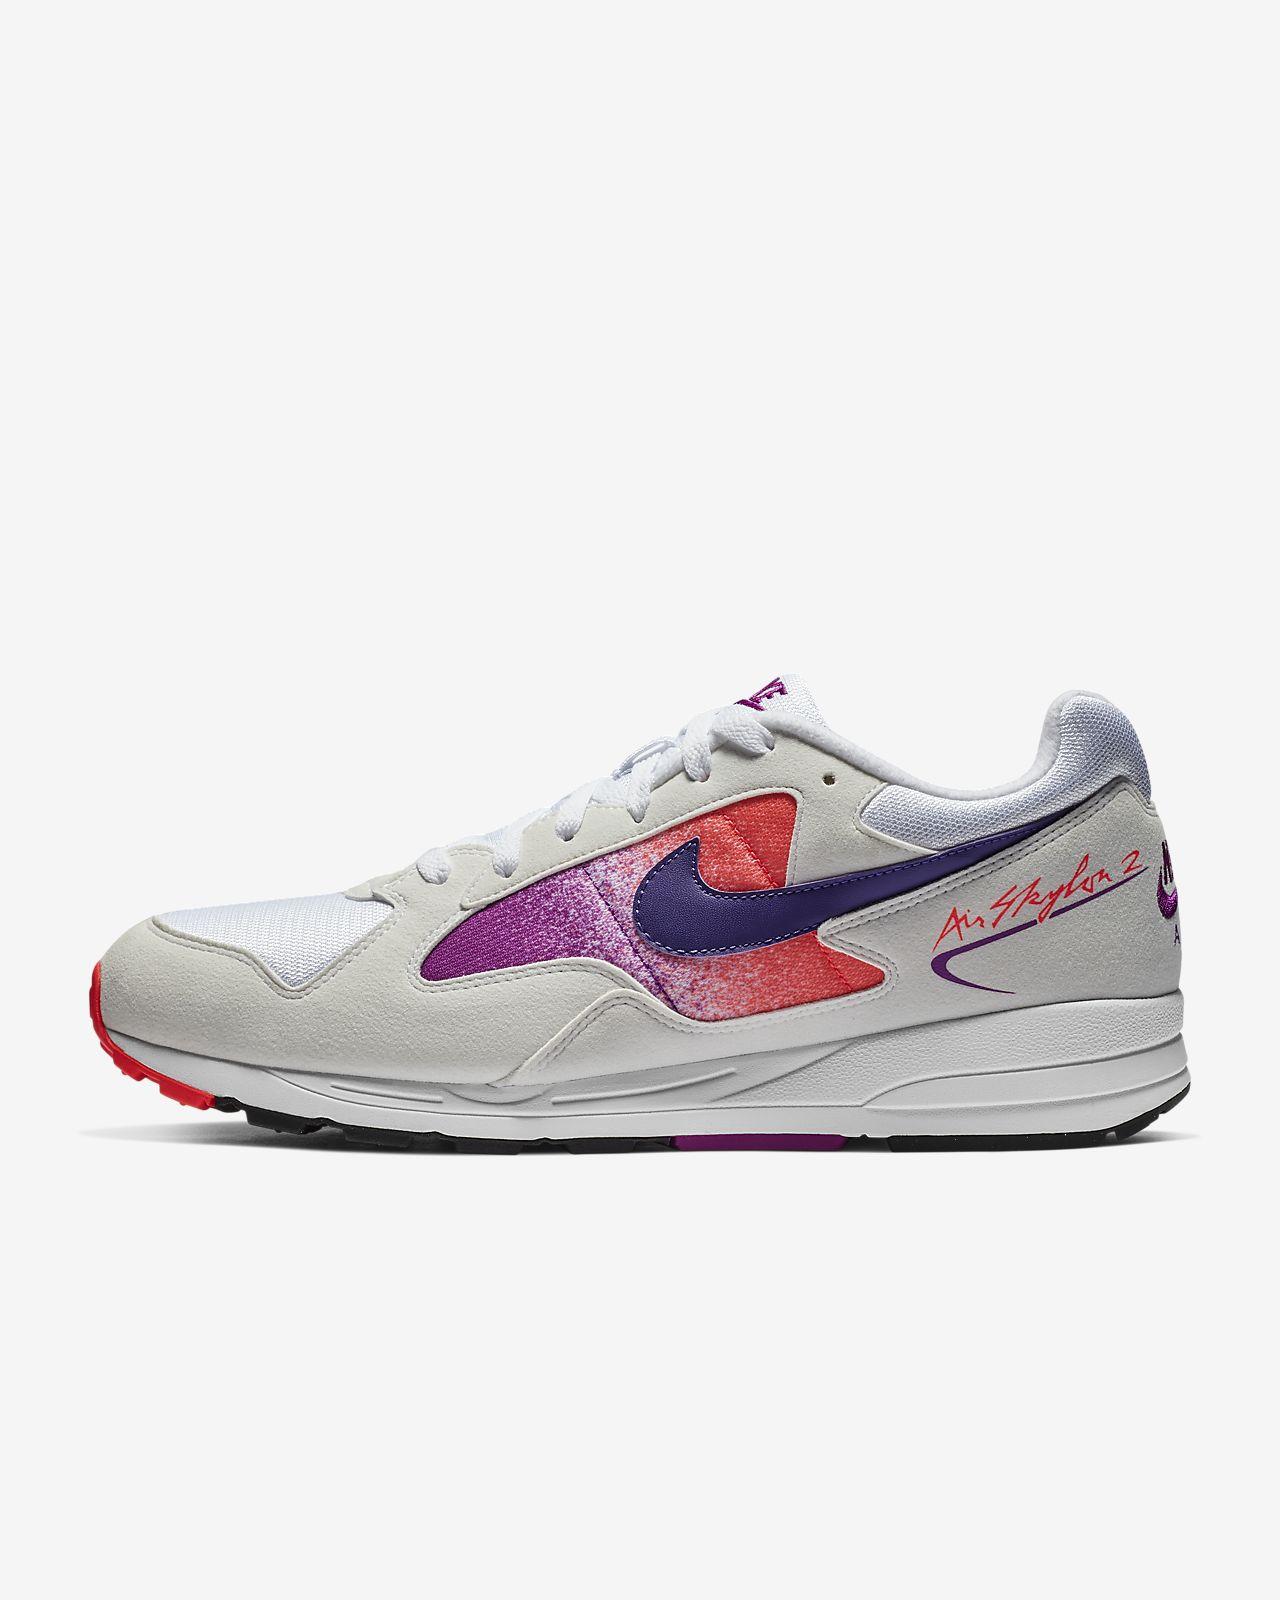 sneakers for cheap 0f261 a771a ... Buty męskie Nike Air Skylon II